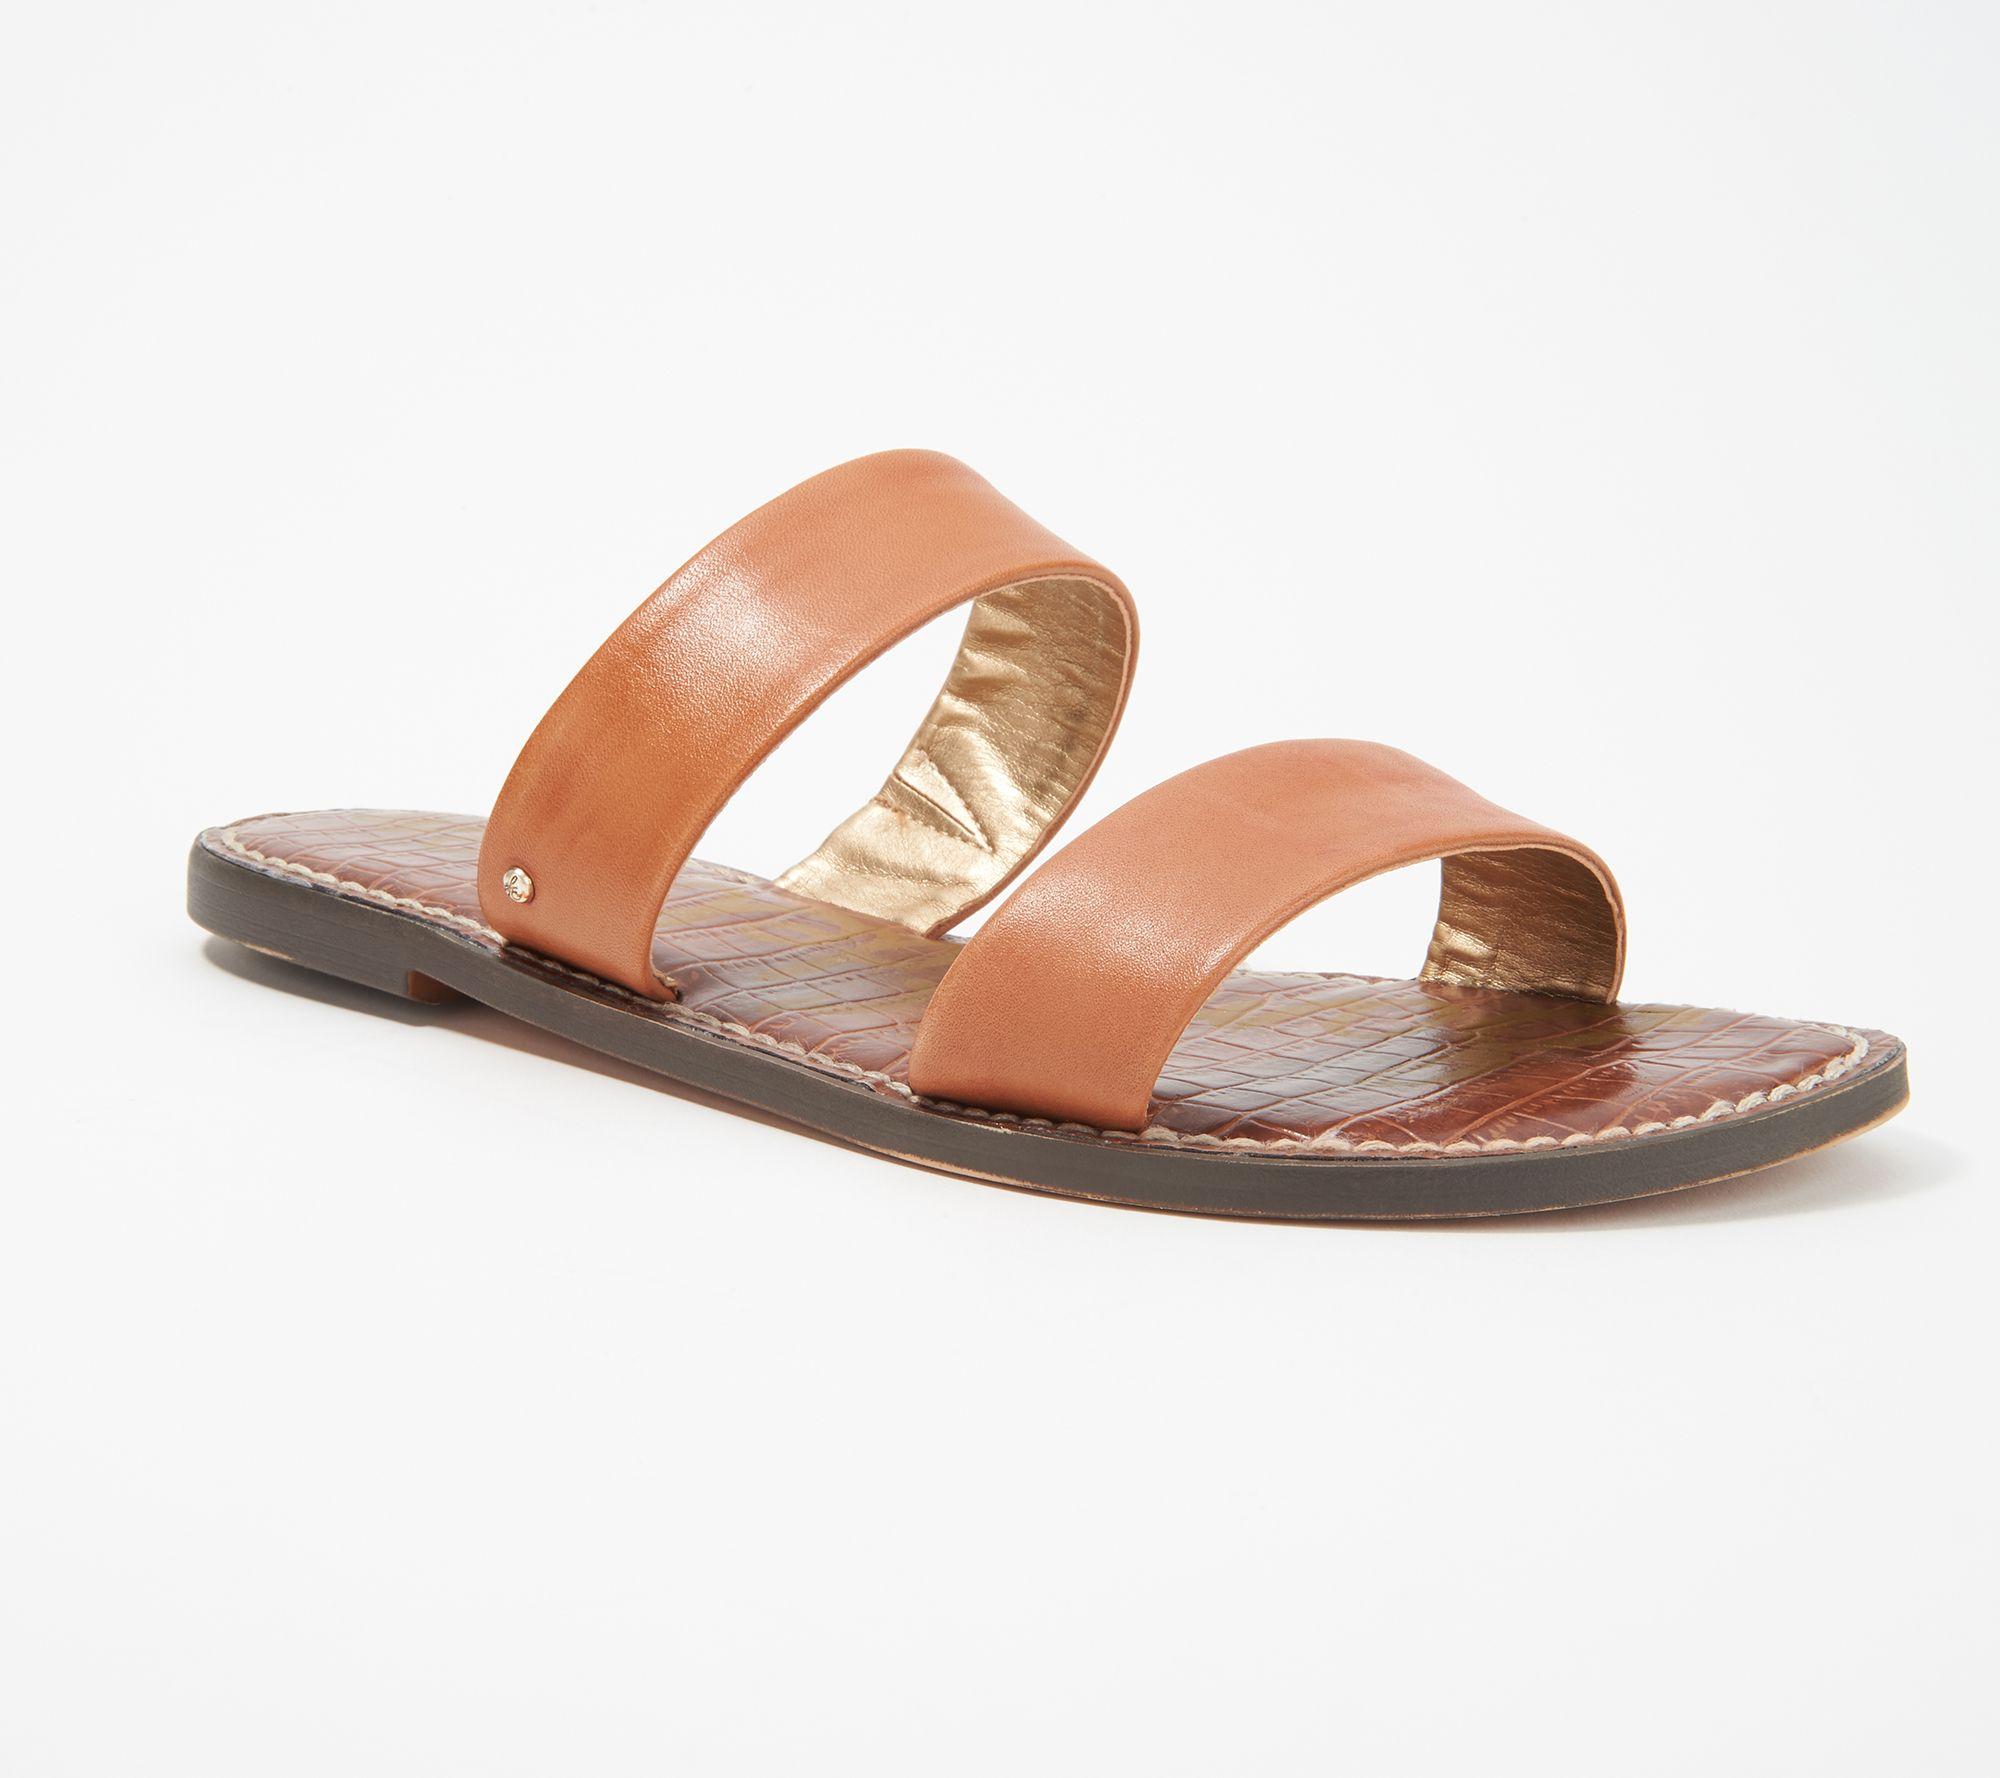 b05a73c31 Sam Edelman Leather Double Strap Slide Sandals - Gala — QVC.com